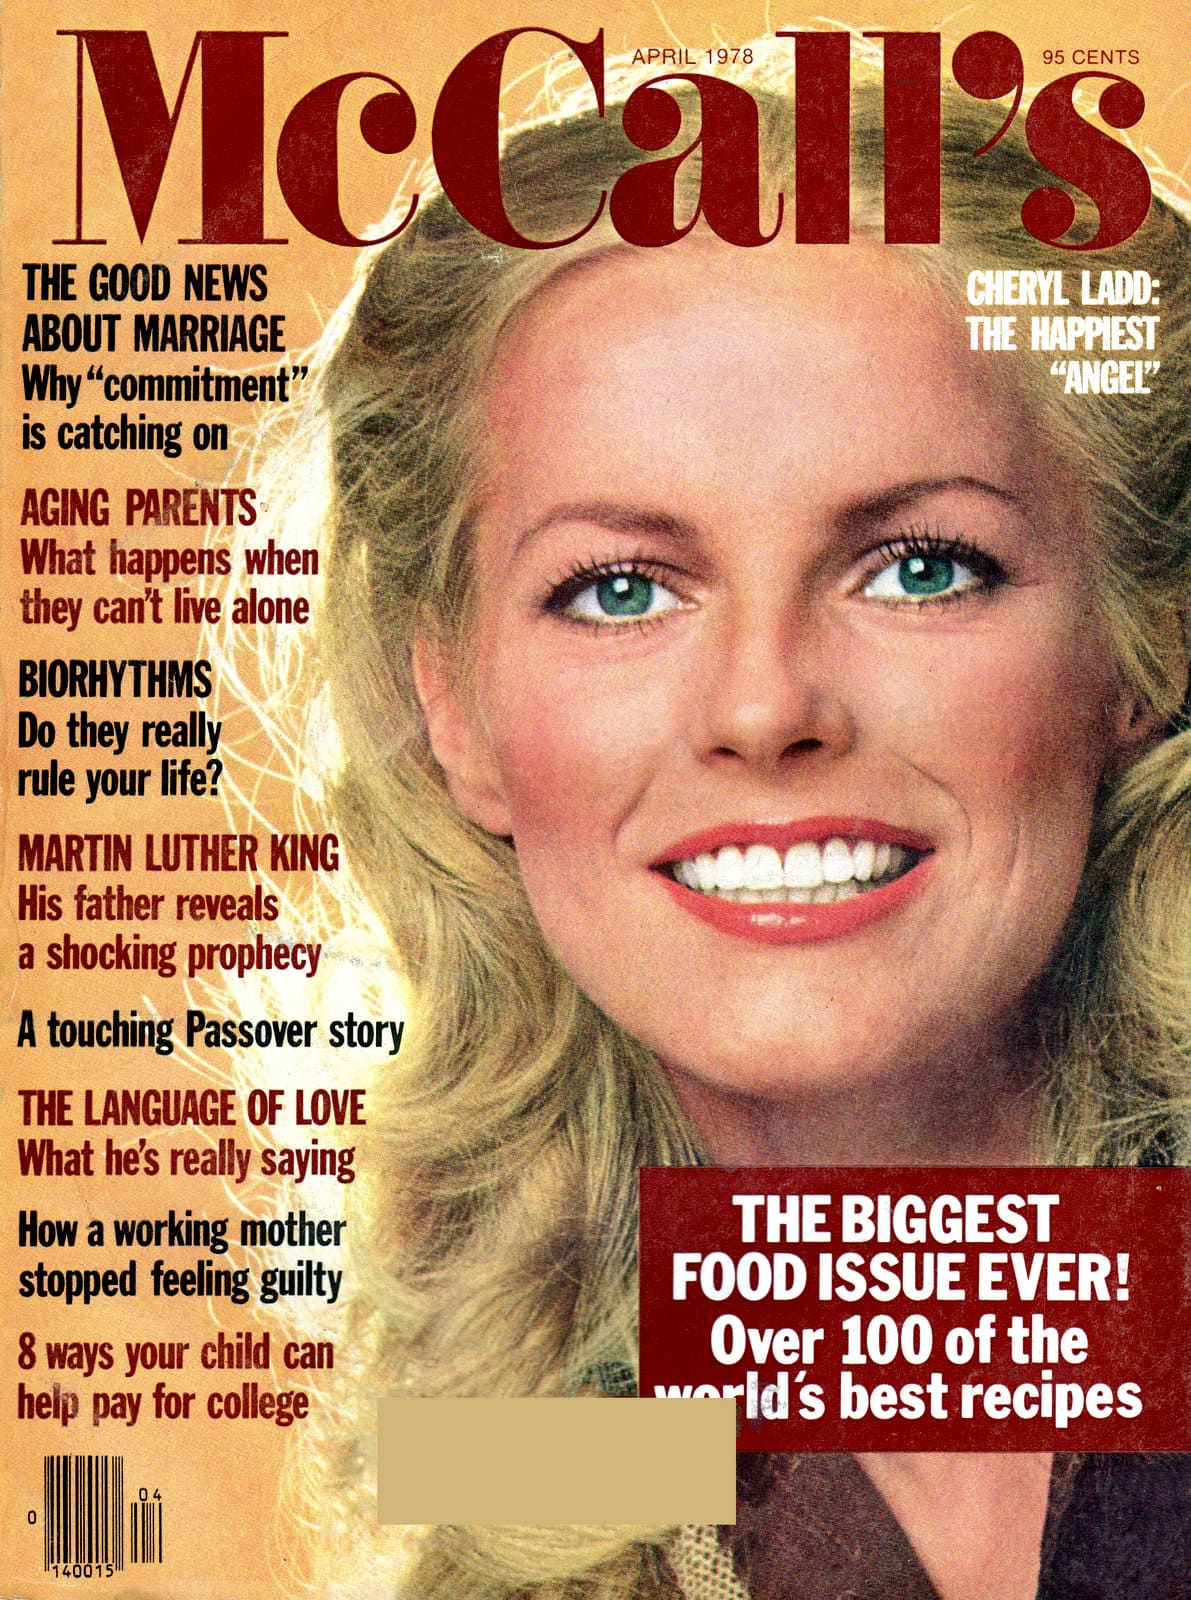 Cheryl Ladd - McCalls magazine cover (1978)